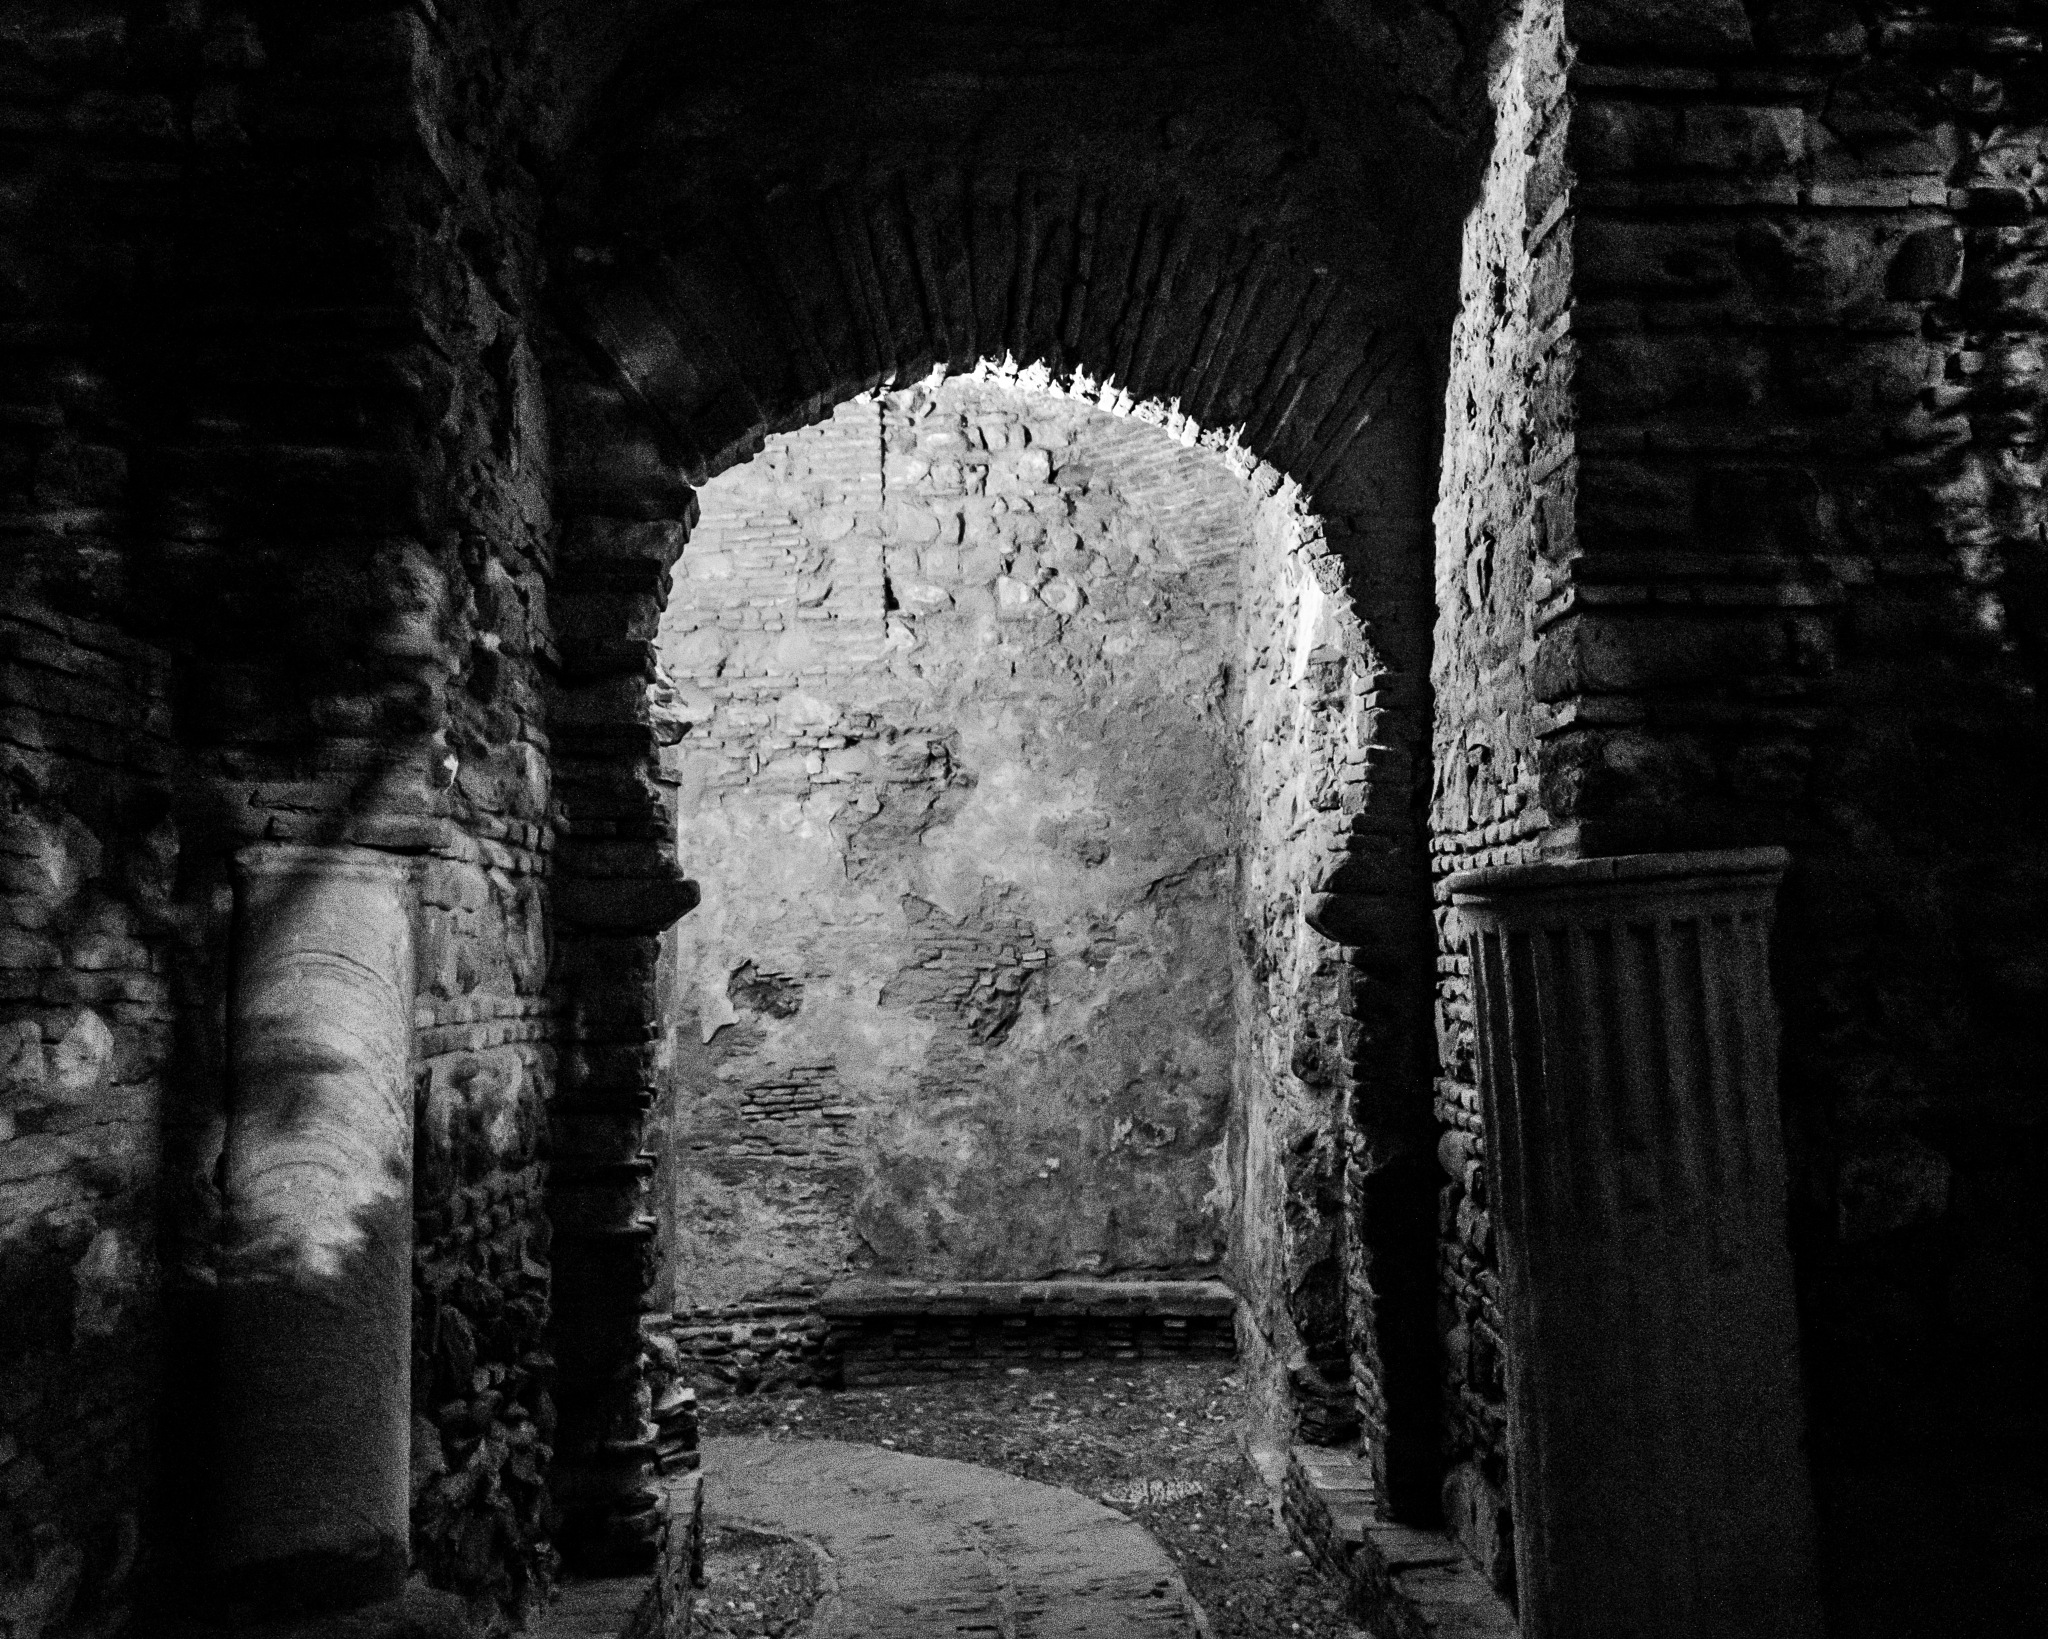 Entrance by Borja Robles